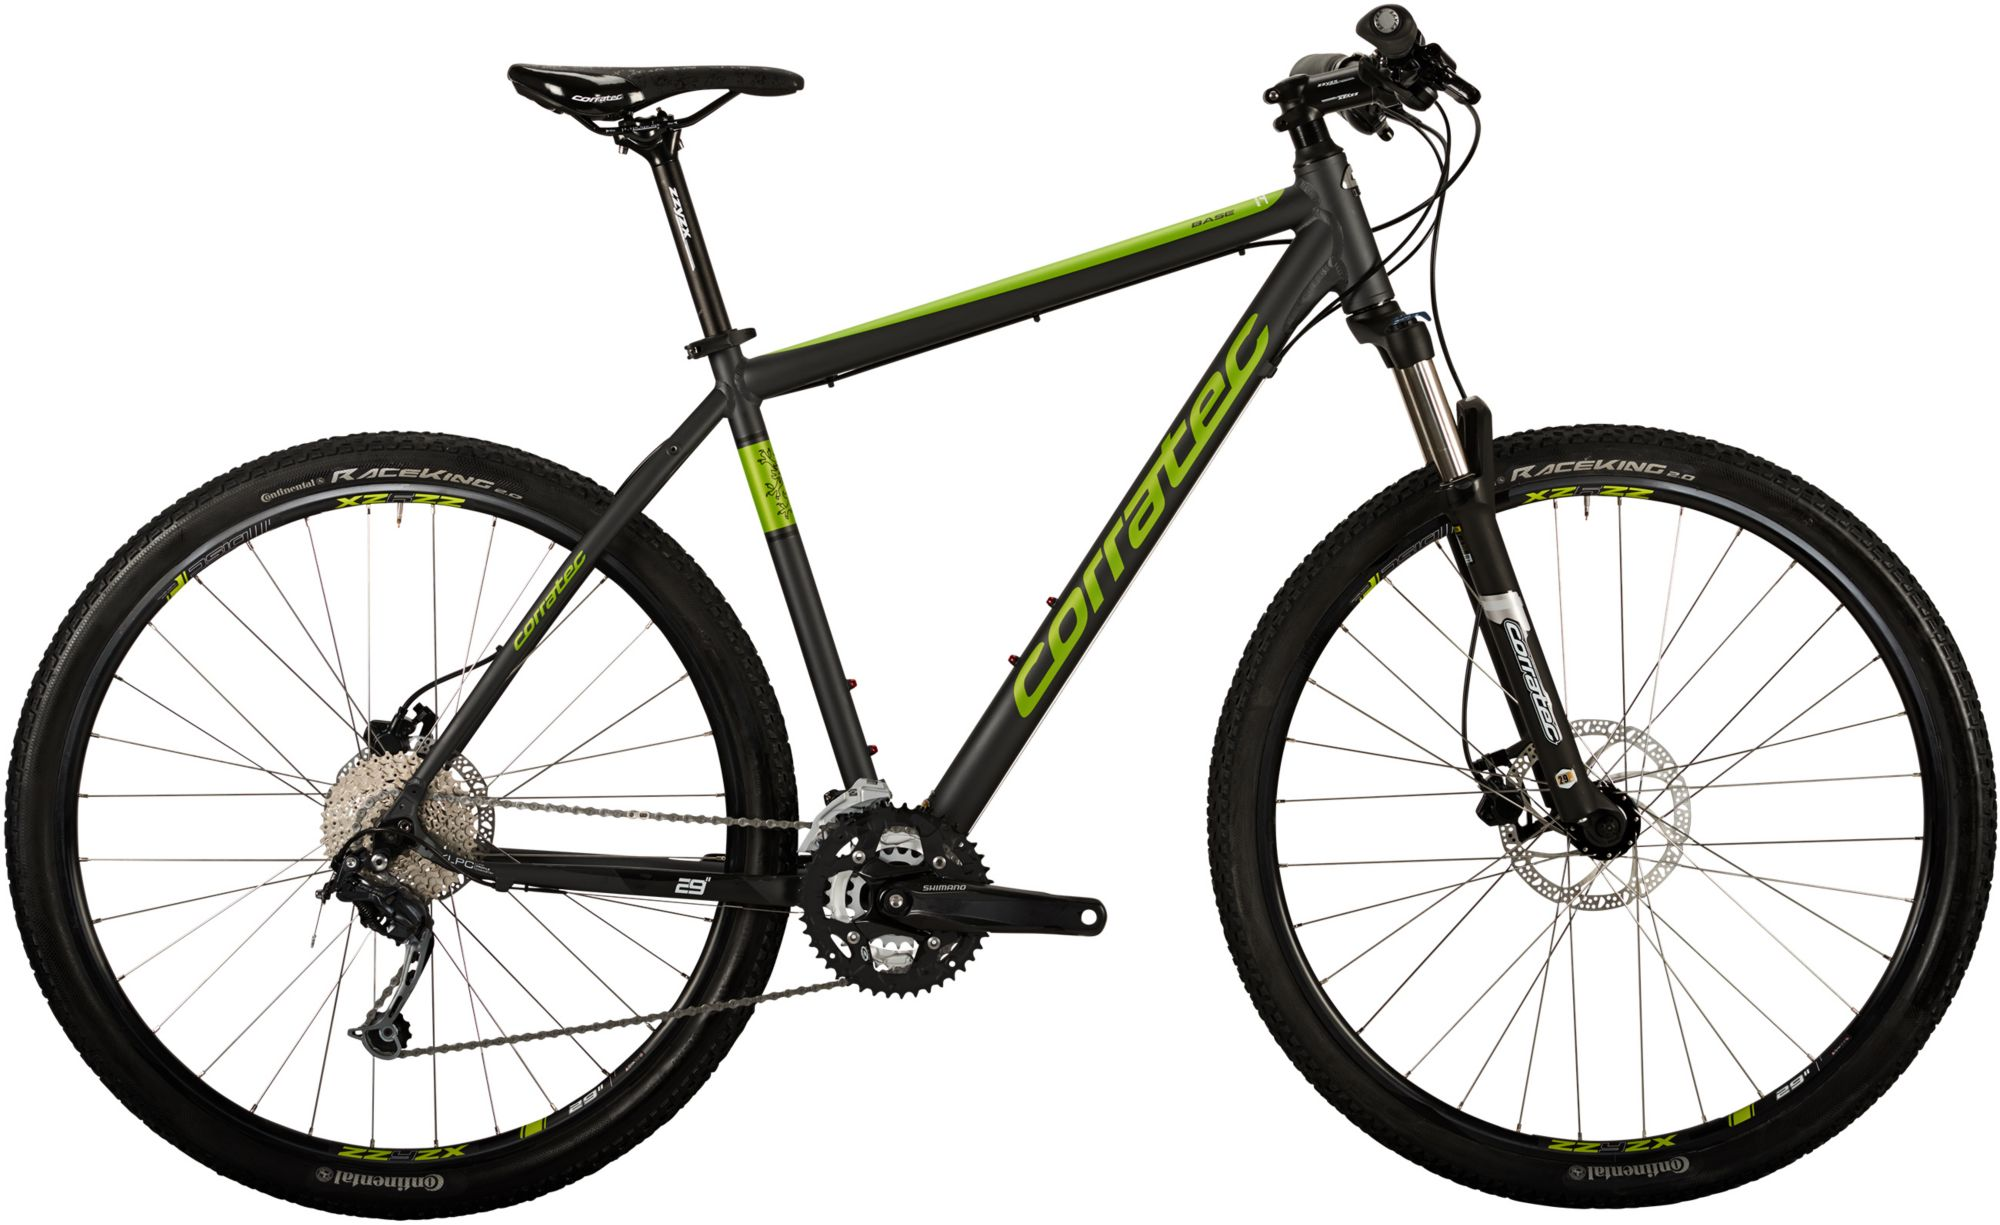 CORRATEC Corratec Hardtail Mountainbike, 29 Zoll, 27 Gang Shimano Deore, »MT CROSS Base Gent«